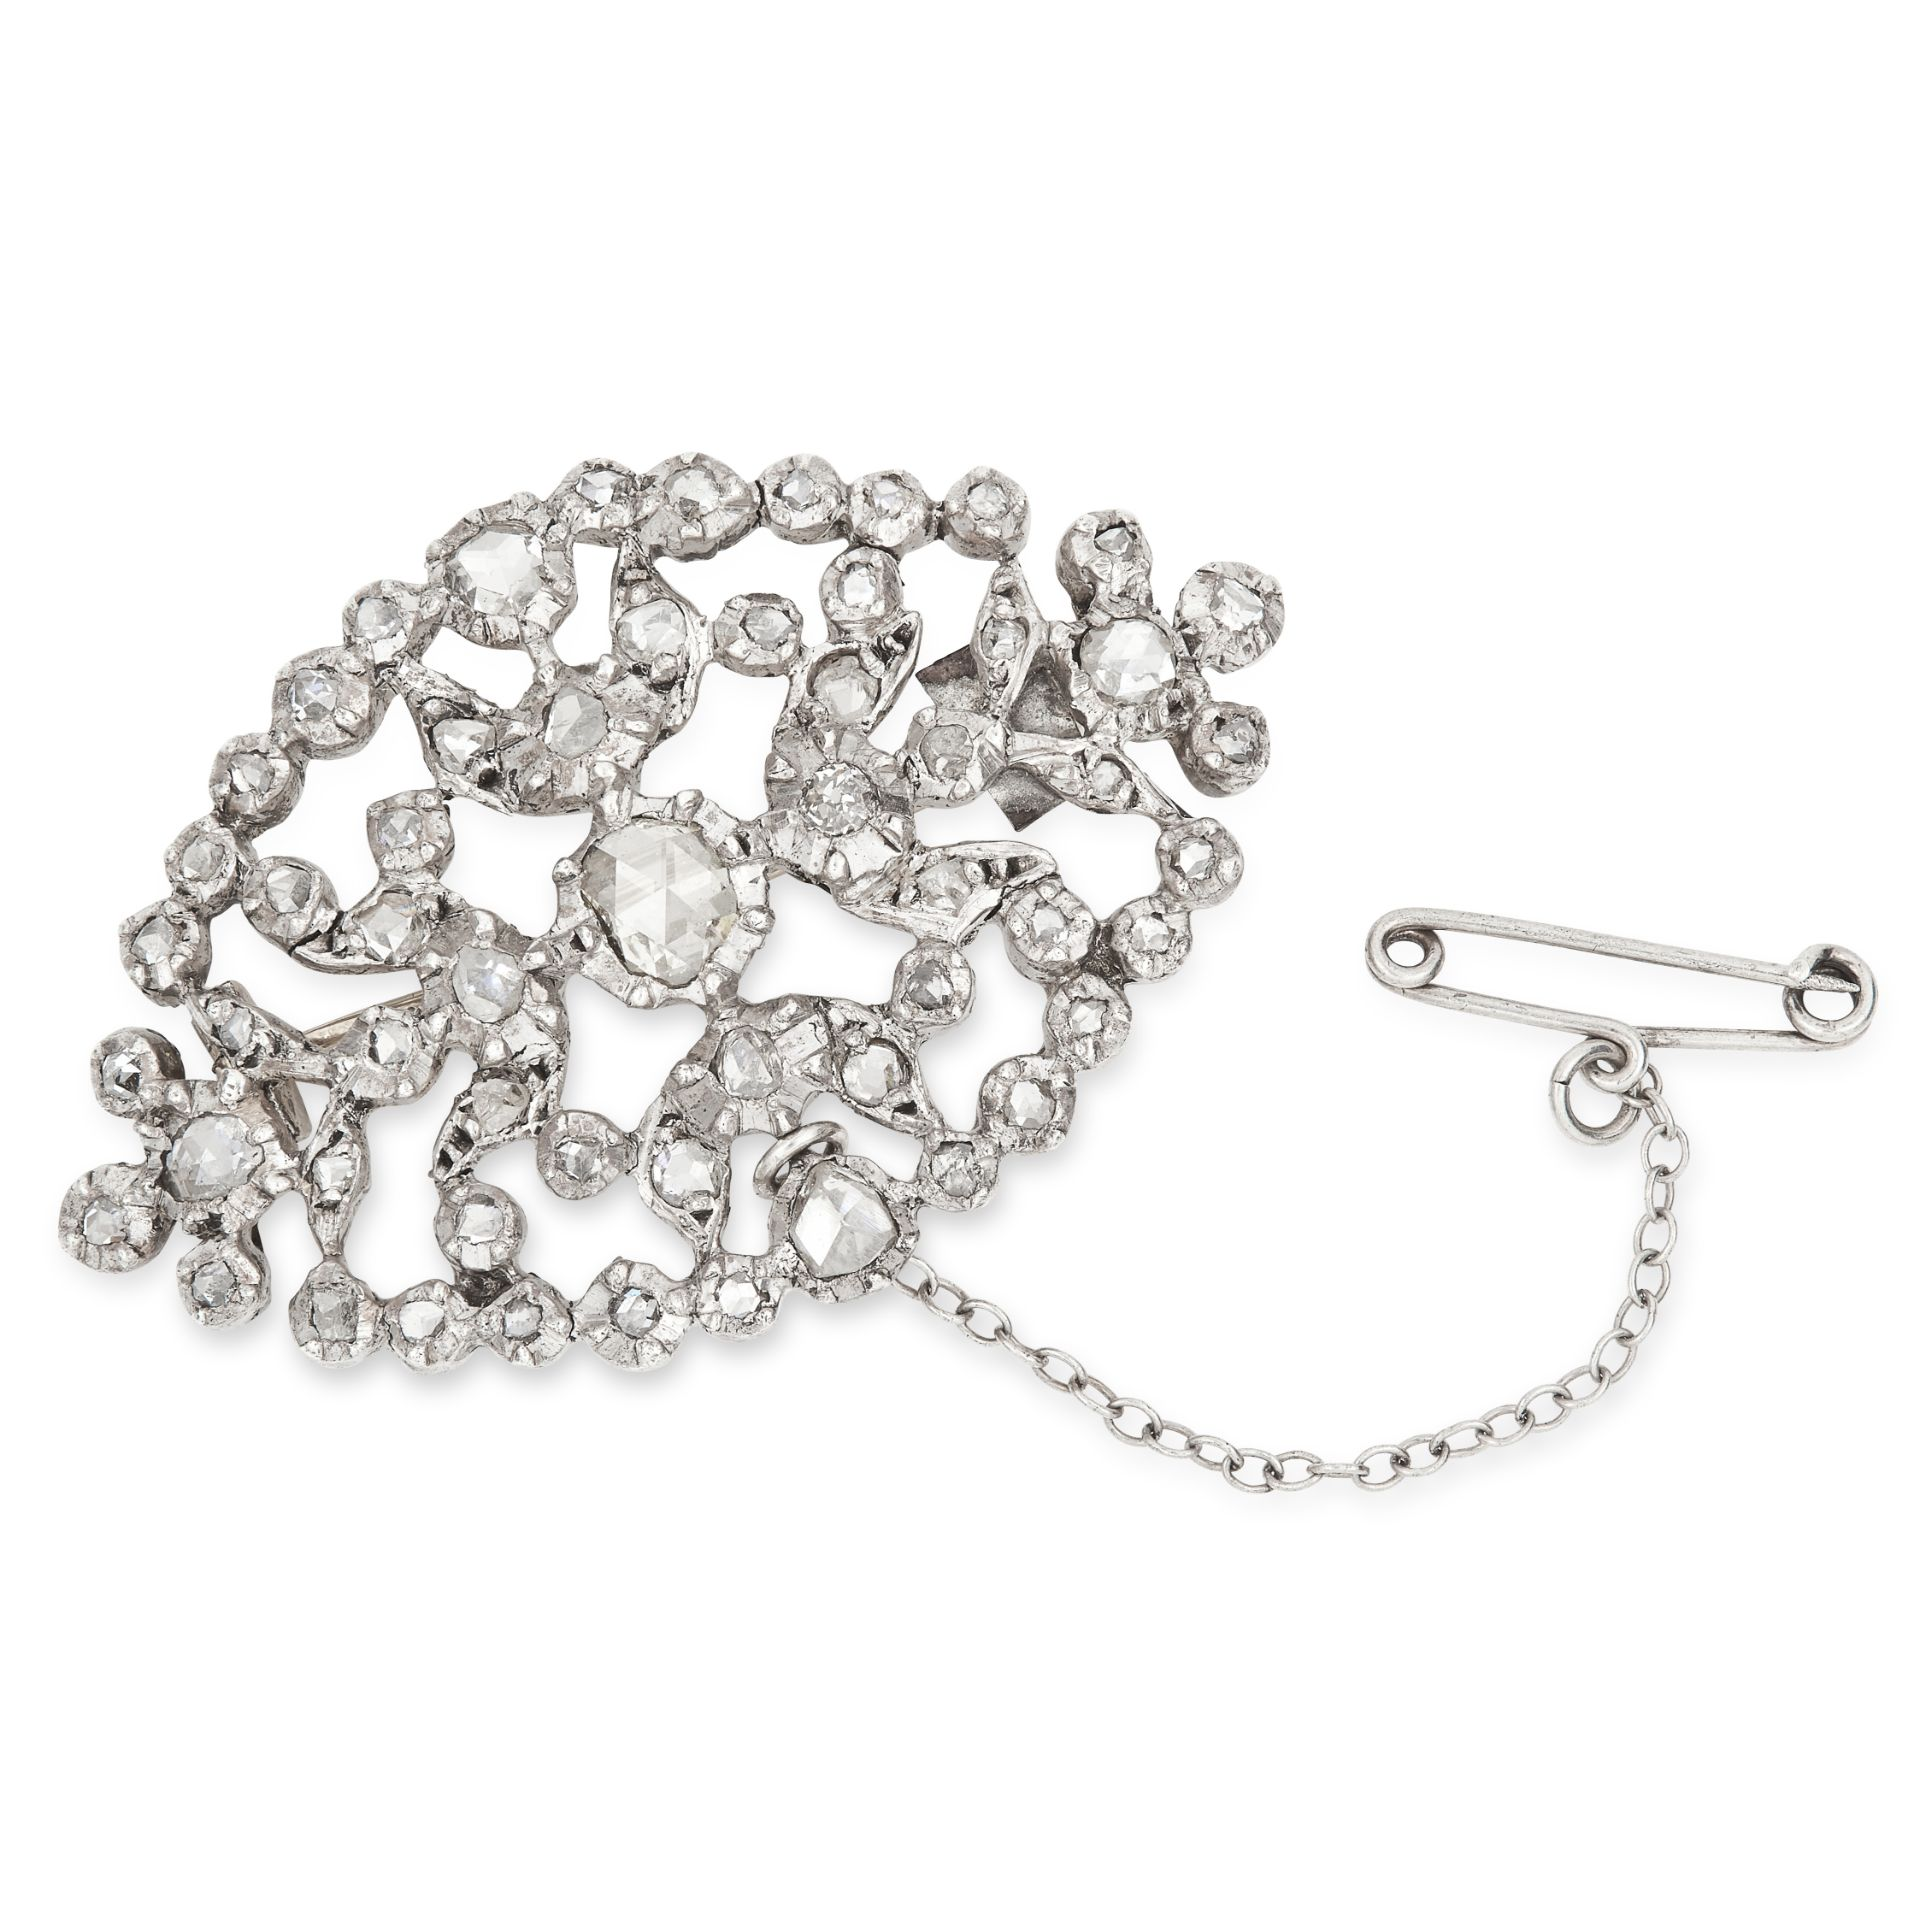 ANTIQUE DIAMOND BROOCH the open framework is set with rose cut diamonds, 4.3cm, 9.4g.